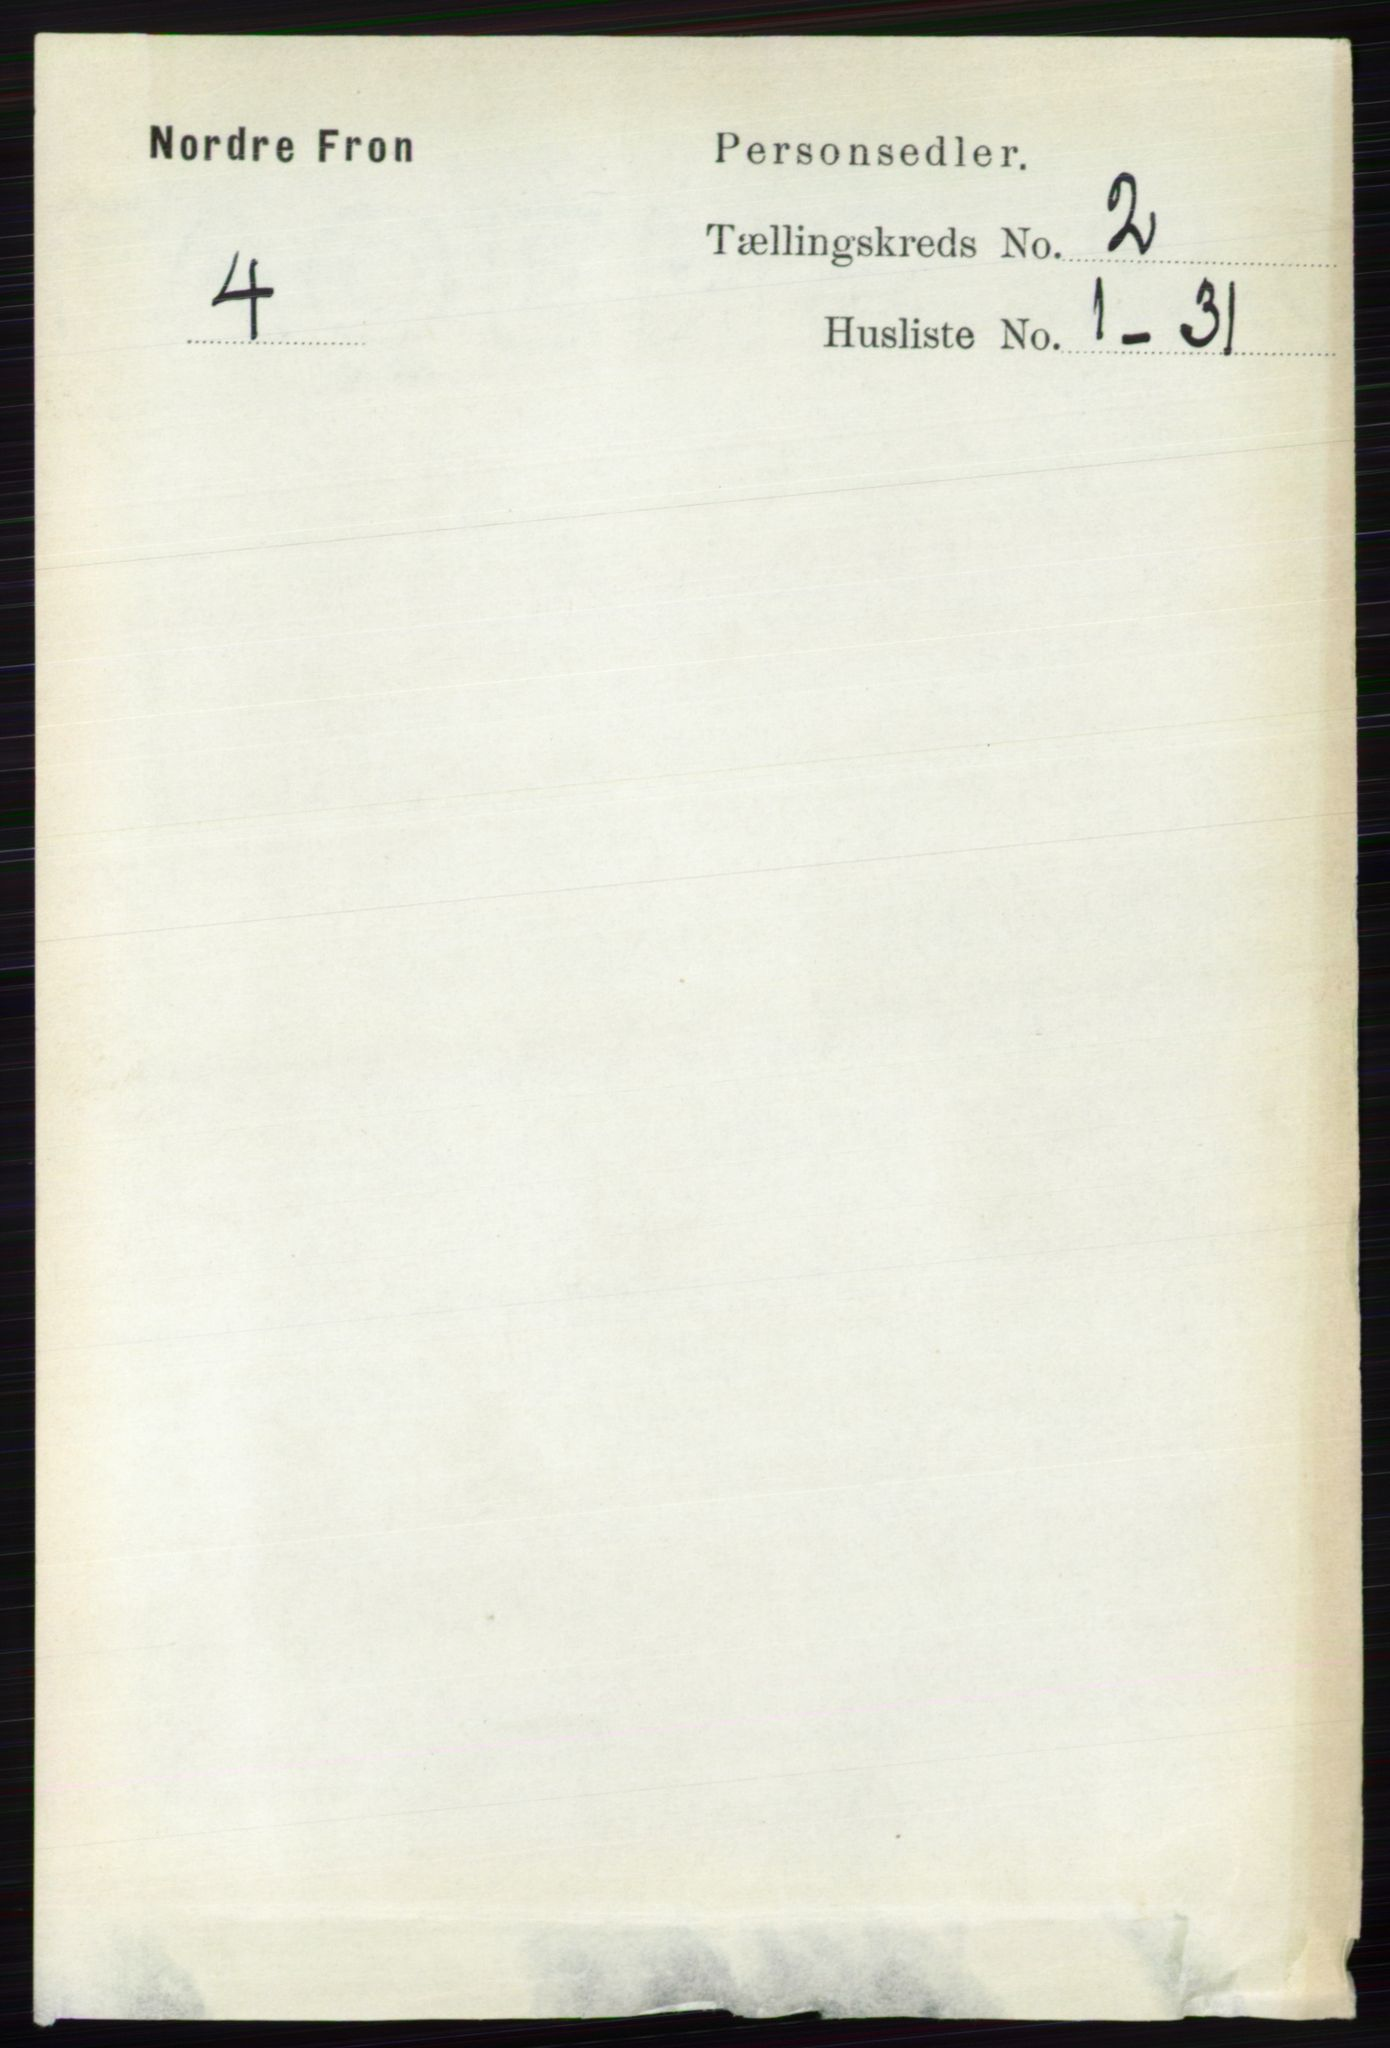 RA, Folketelling 1891 for 0518 Nord-Fron herred, 1891, s. 340